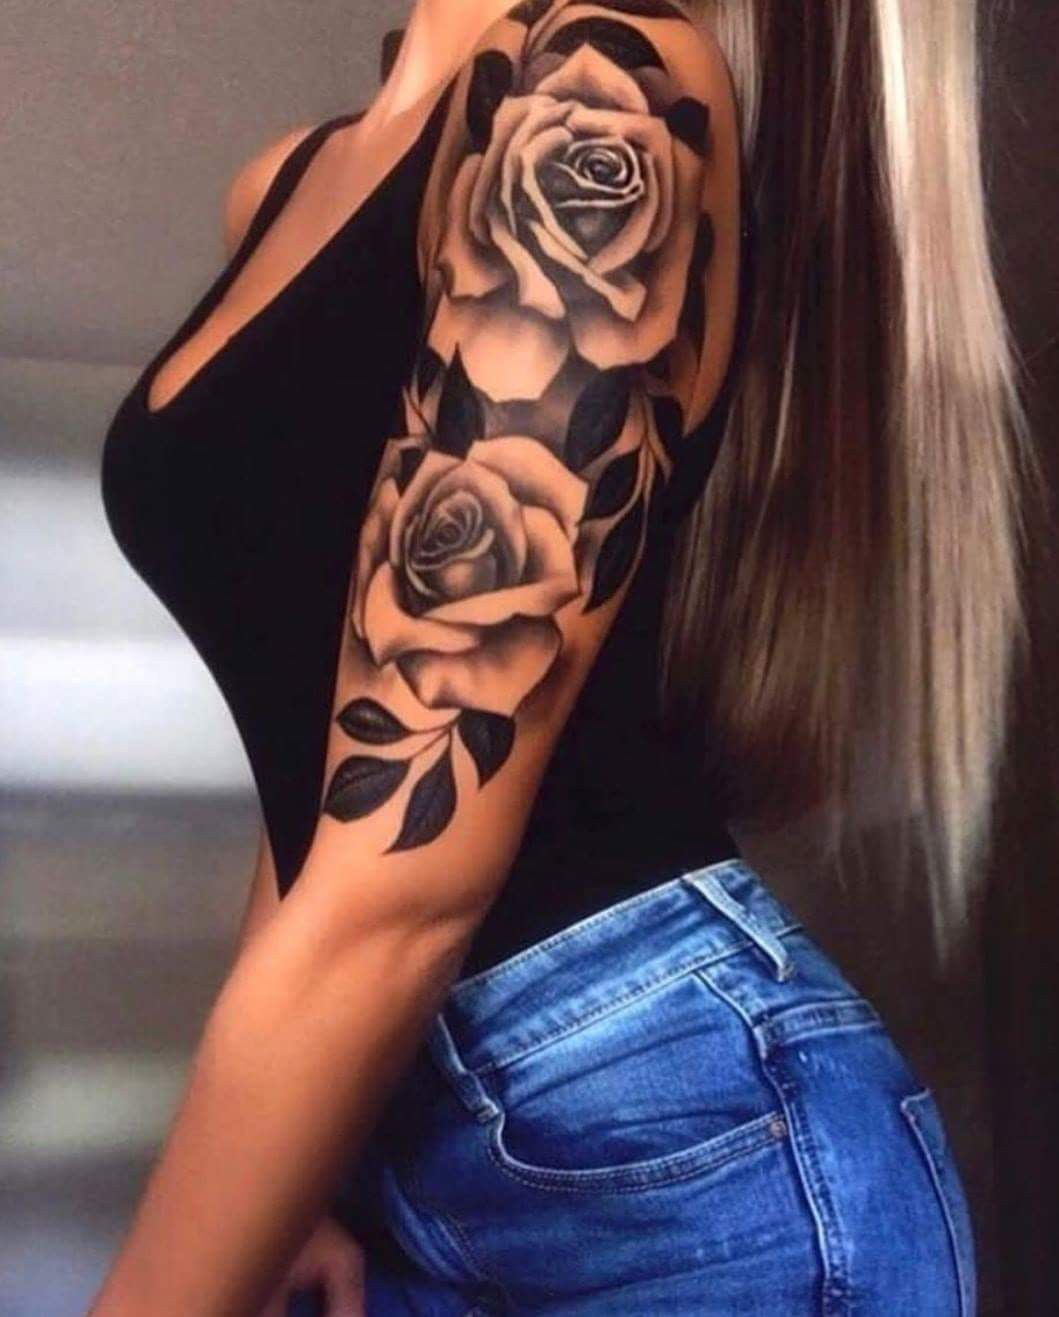 Arm frau tattoo rosen 55 Best